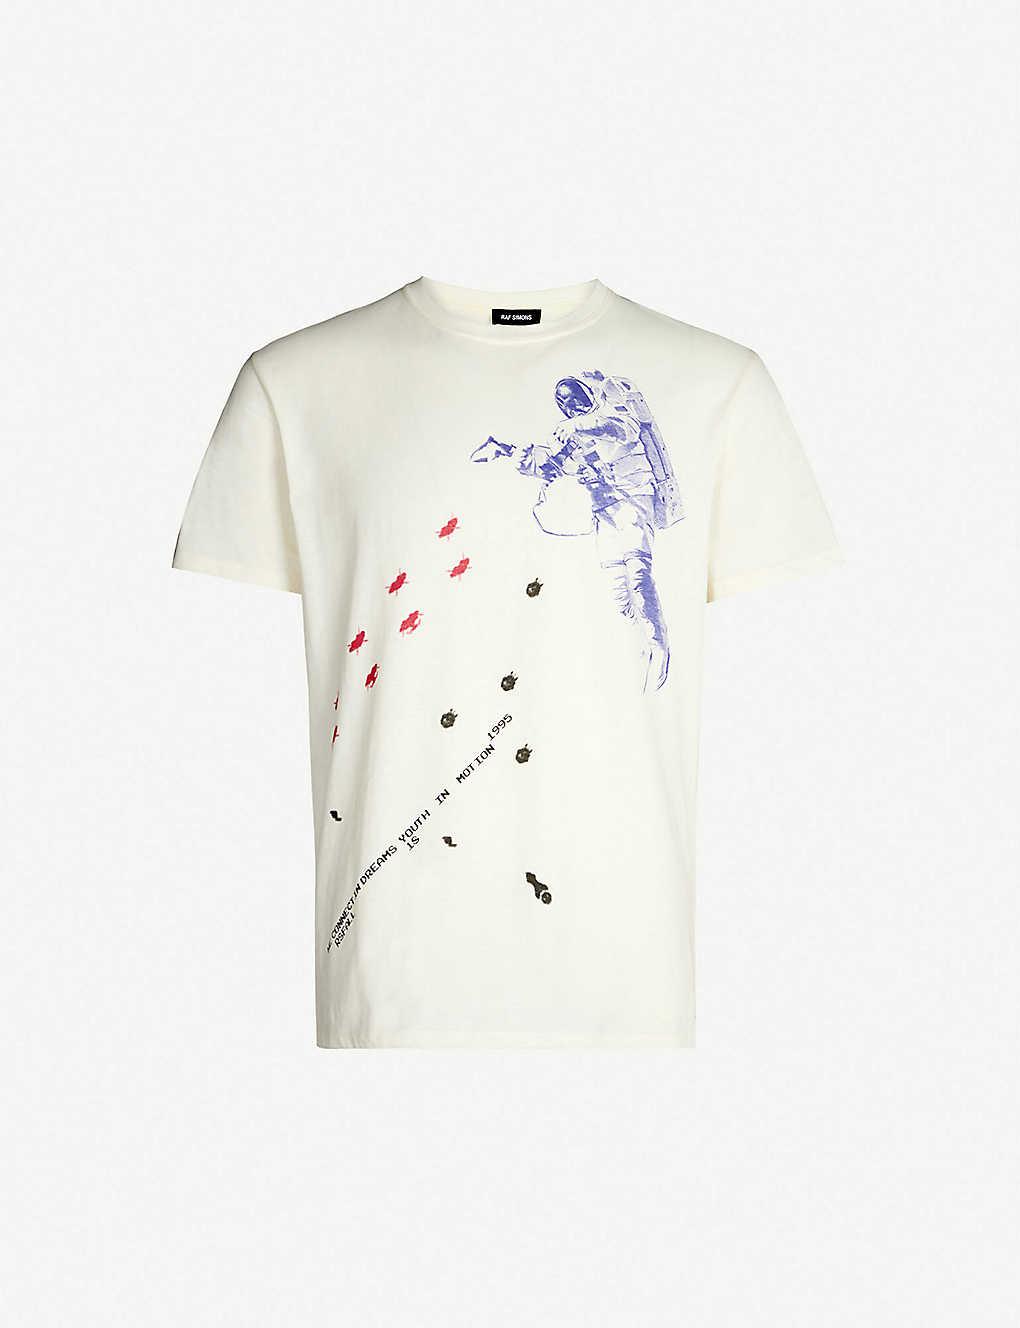 4619db525 RAF SIMONS - Astronaut-print cotton-jersey T-shirt | Selfridges.com